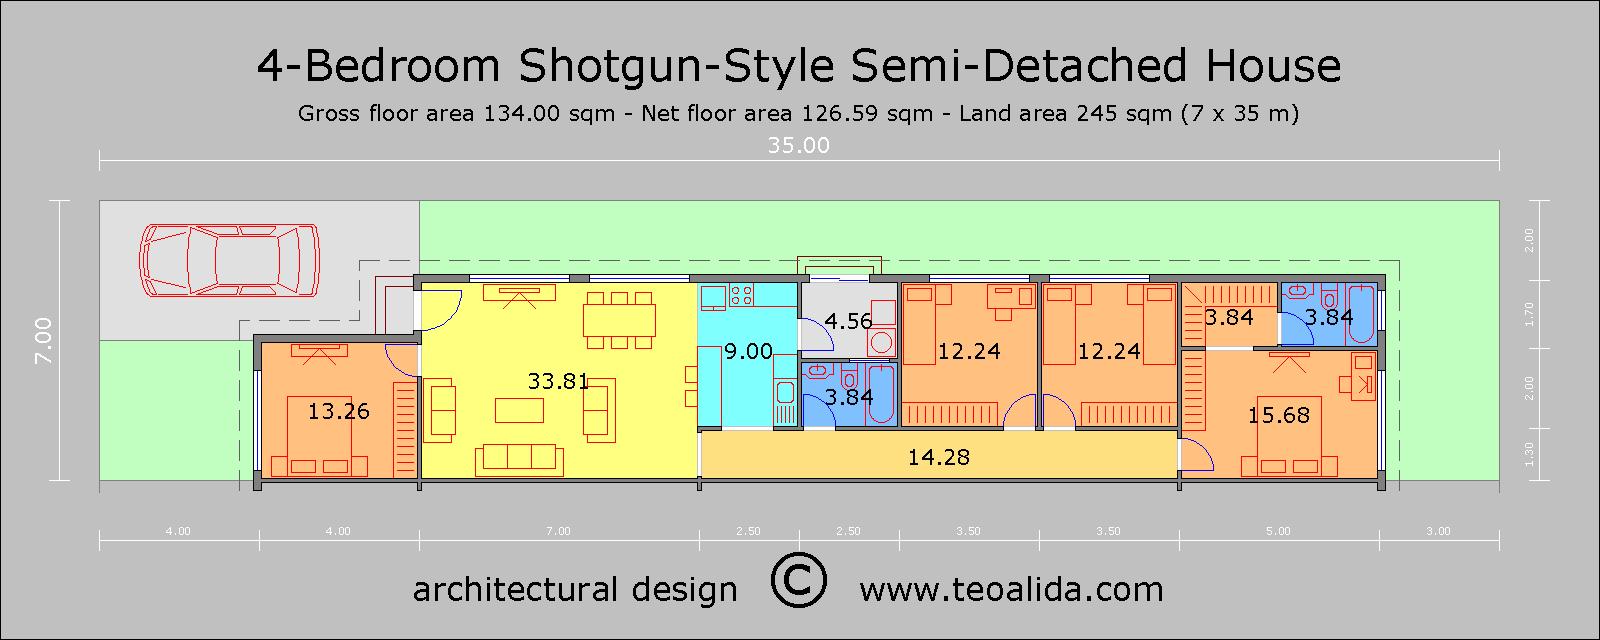 Shotgun Home 4 bed